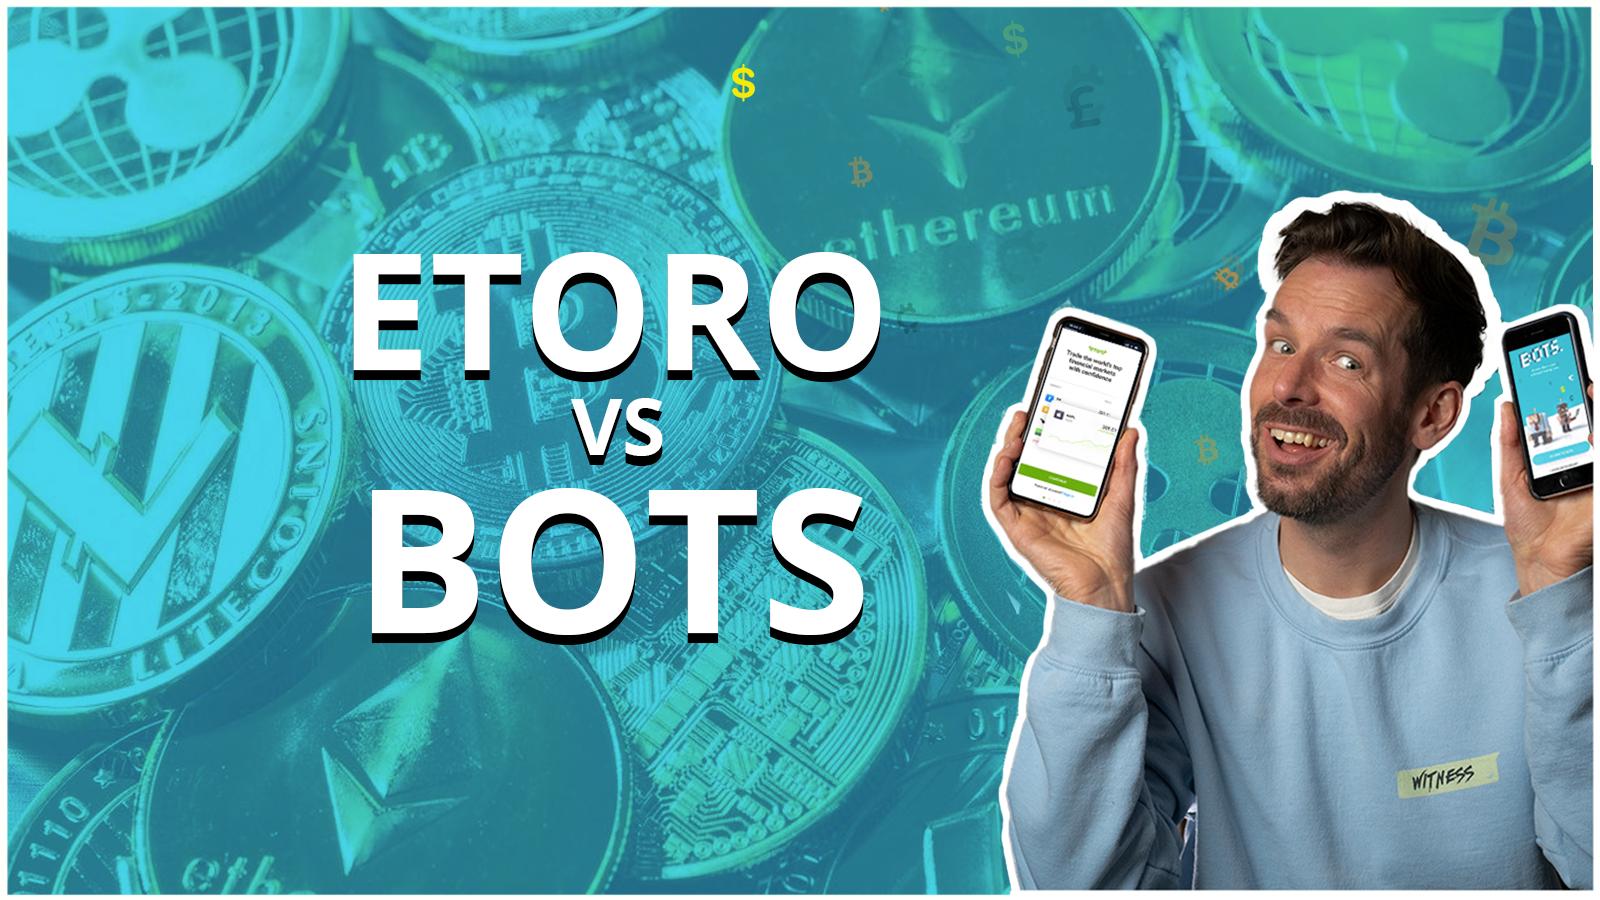 BOTS versus eToro